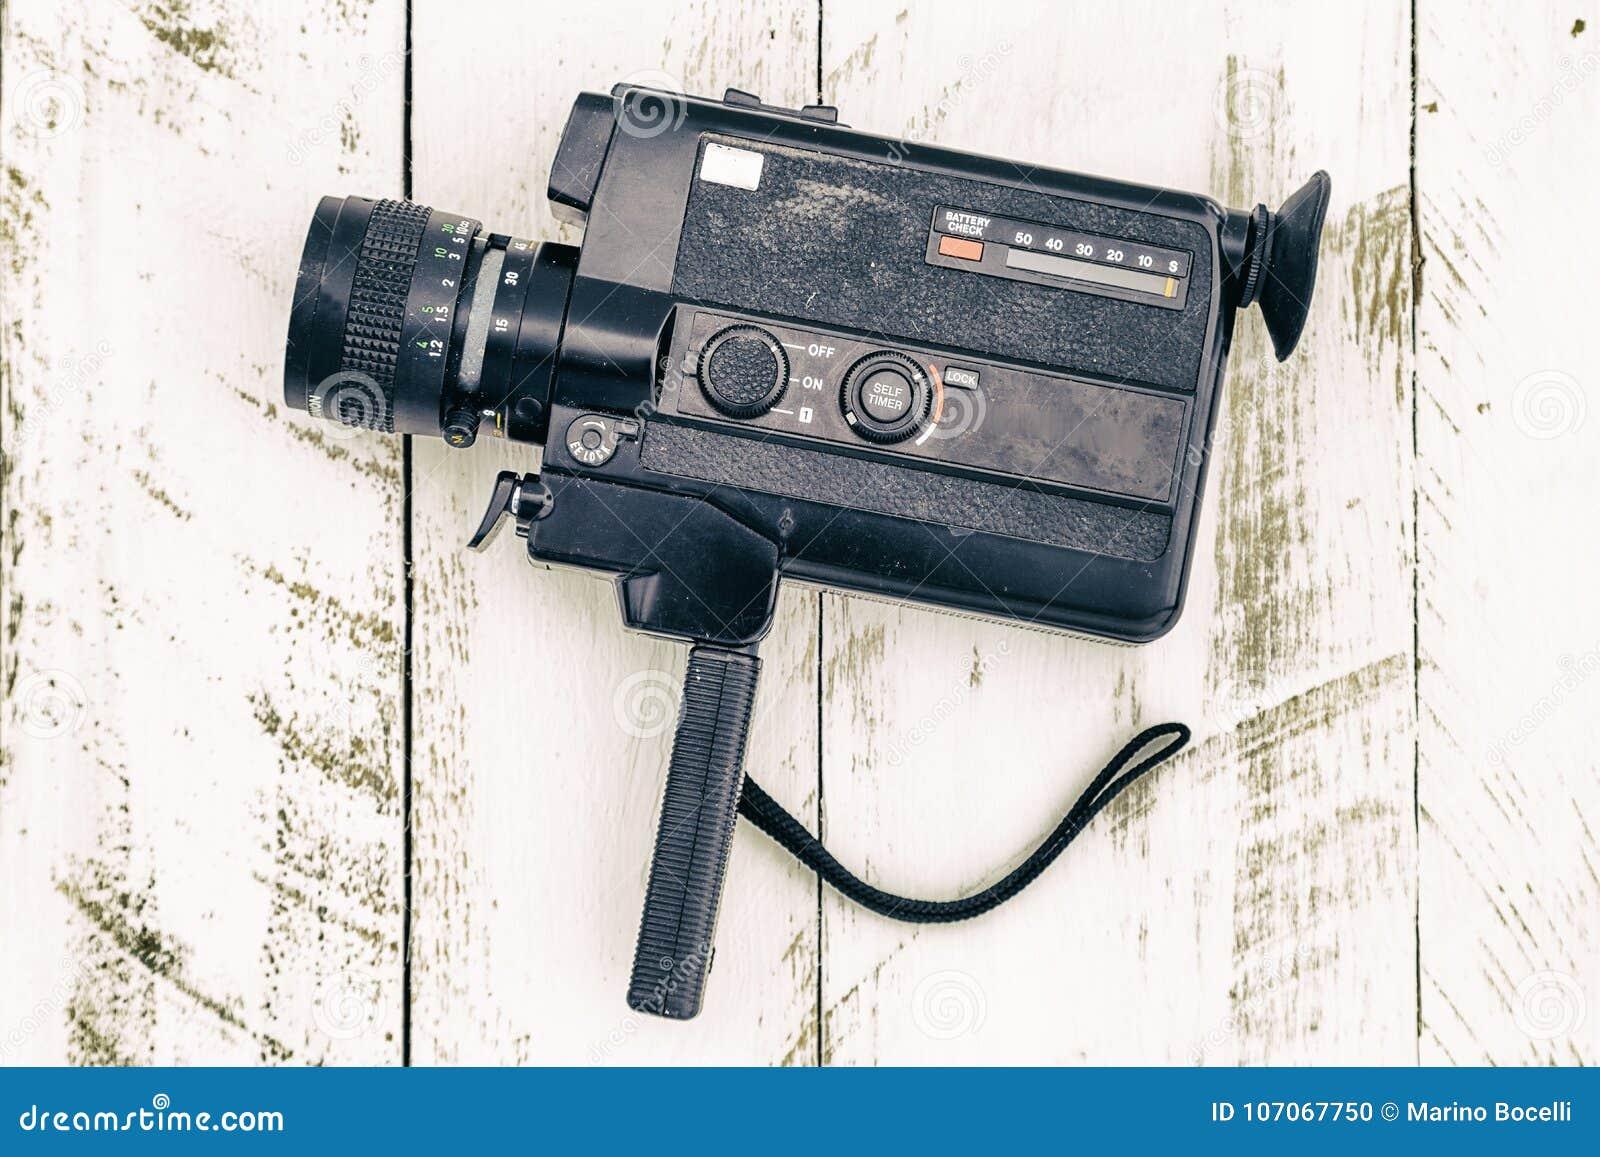 Old Vintage Analog Video Camera Black Colored Stock Photo   Image ...